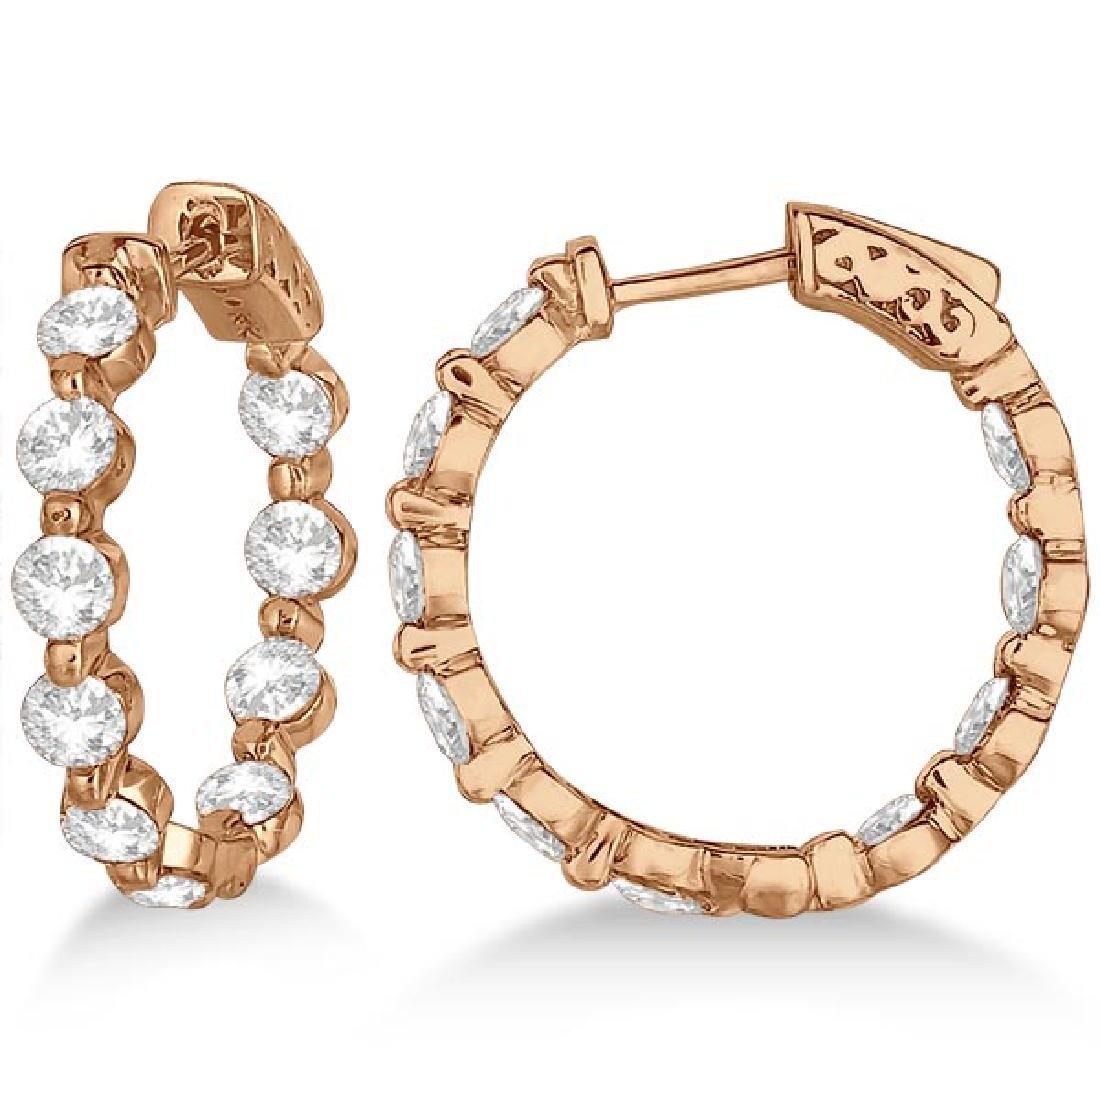 Small Round Floating Diamond Hoop Earrings 14k Rose Gol